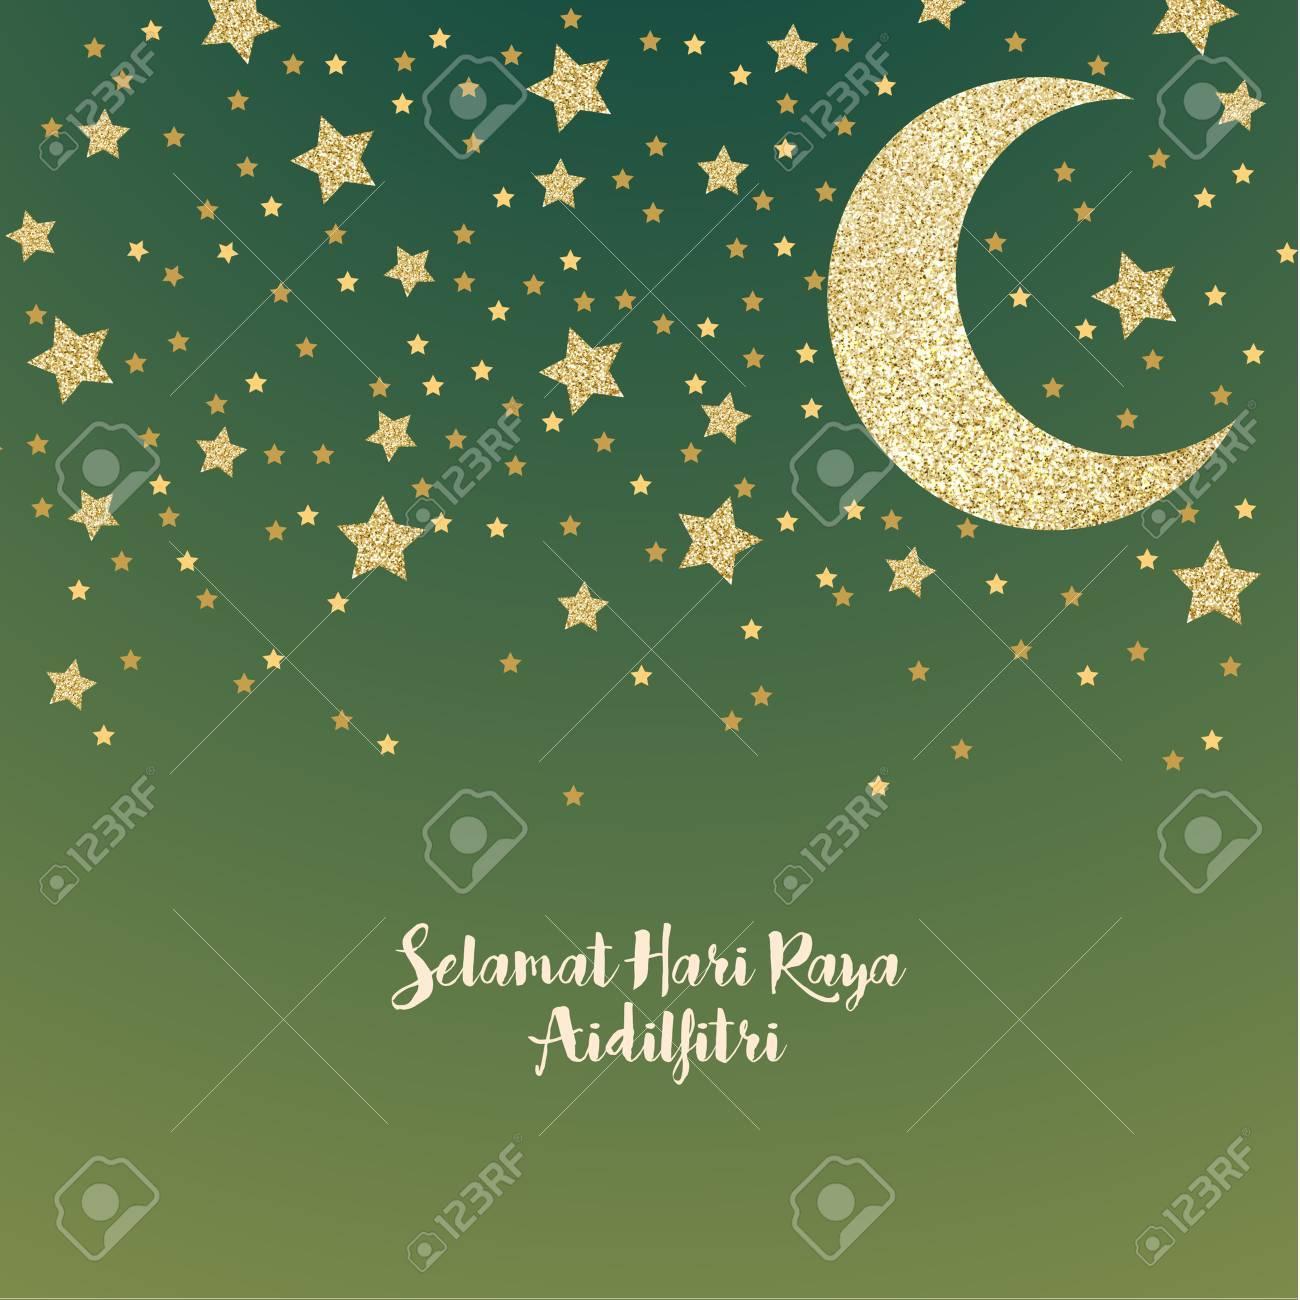 Beautiful Today Eid Al-Fitr Greeting - 62025145-eid-al-fitr-greeting-vector-design-celebration-of-breaking-fast  Trends_431424 .jpg